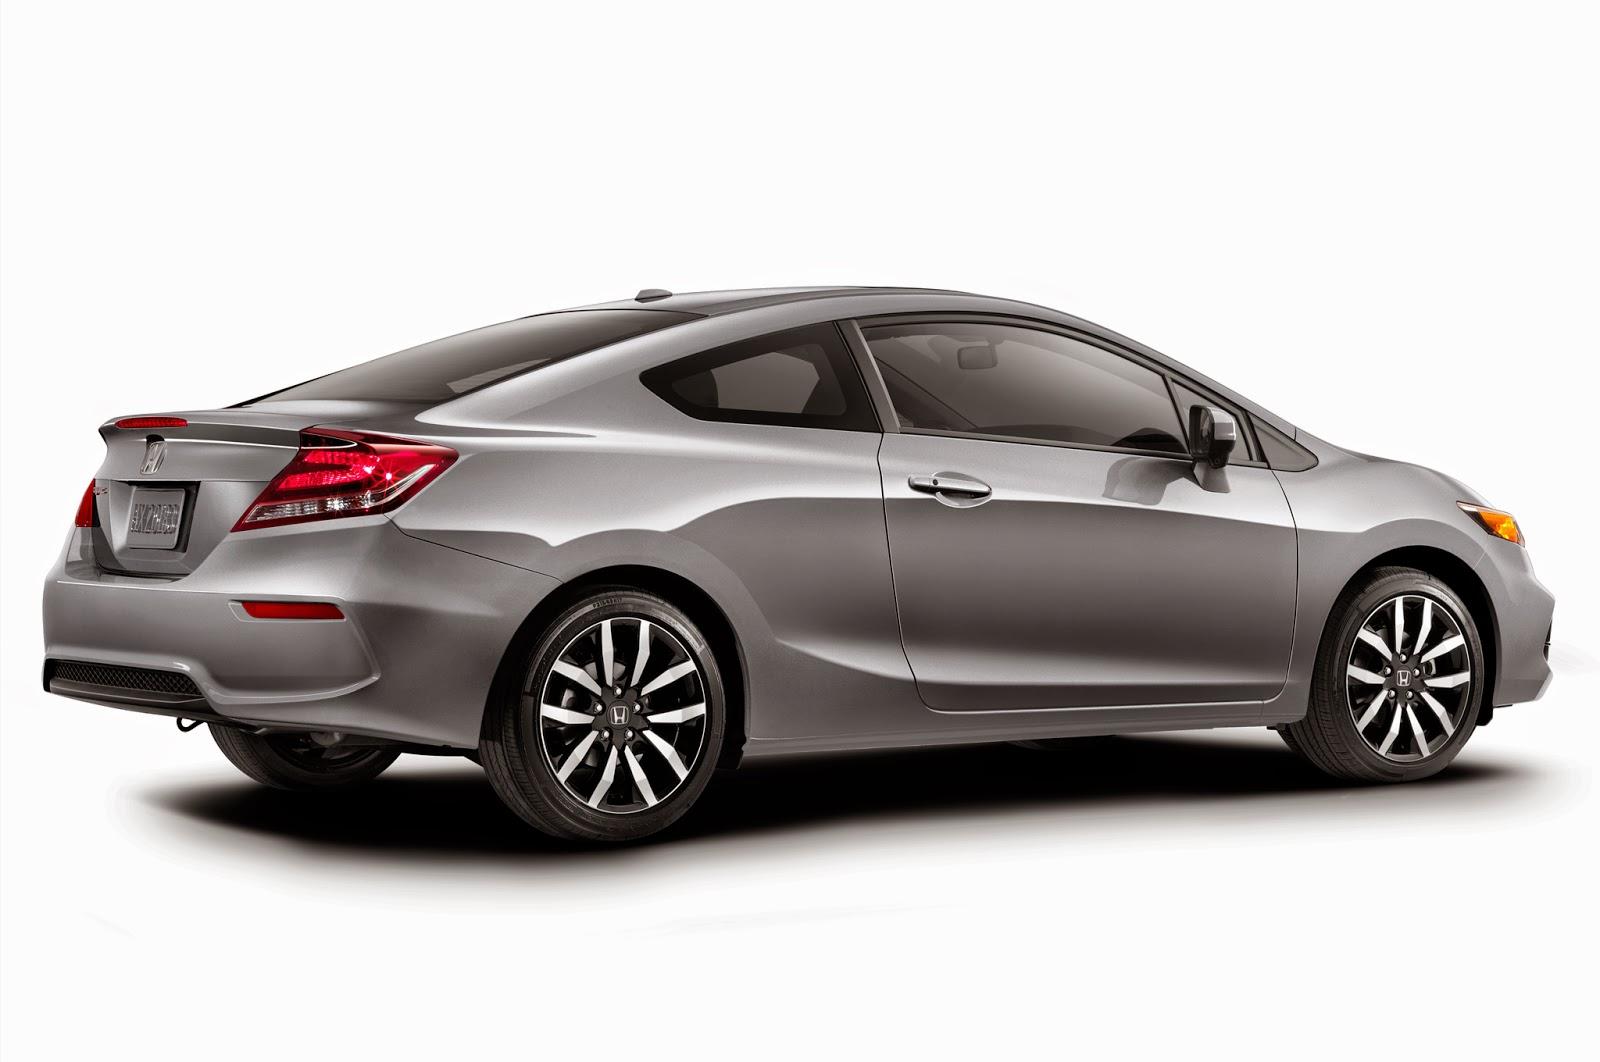 Gambar Honda Civic 2015